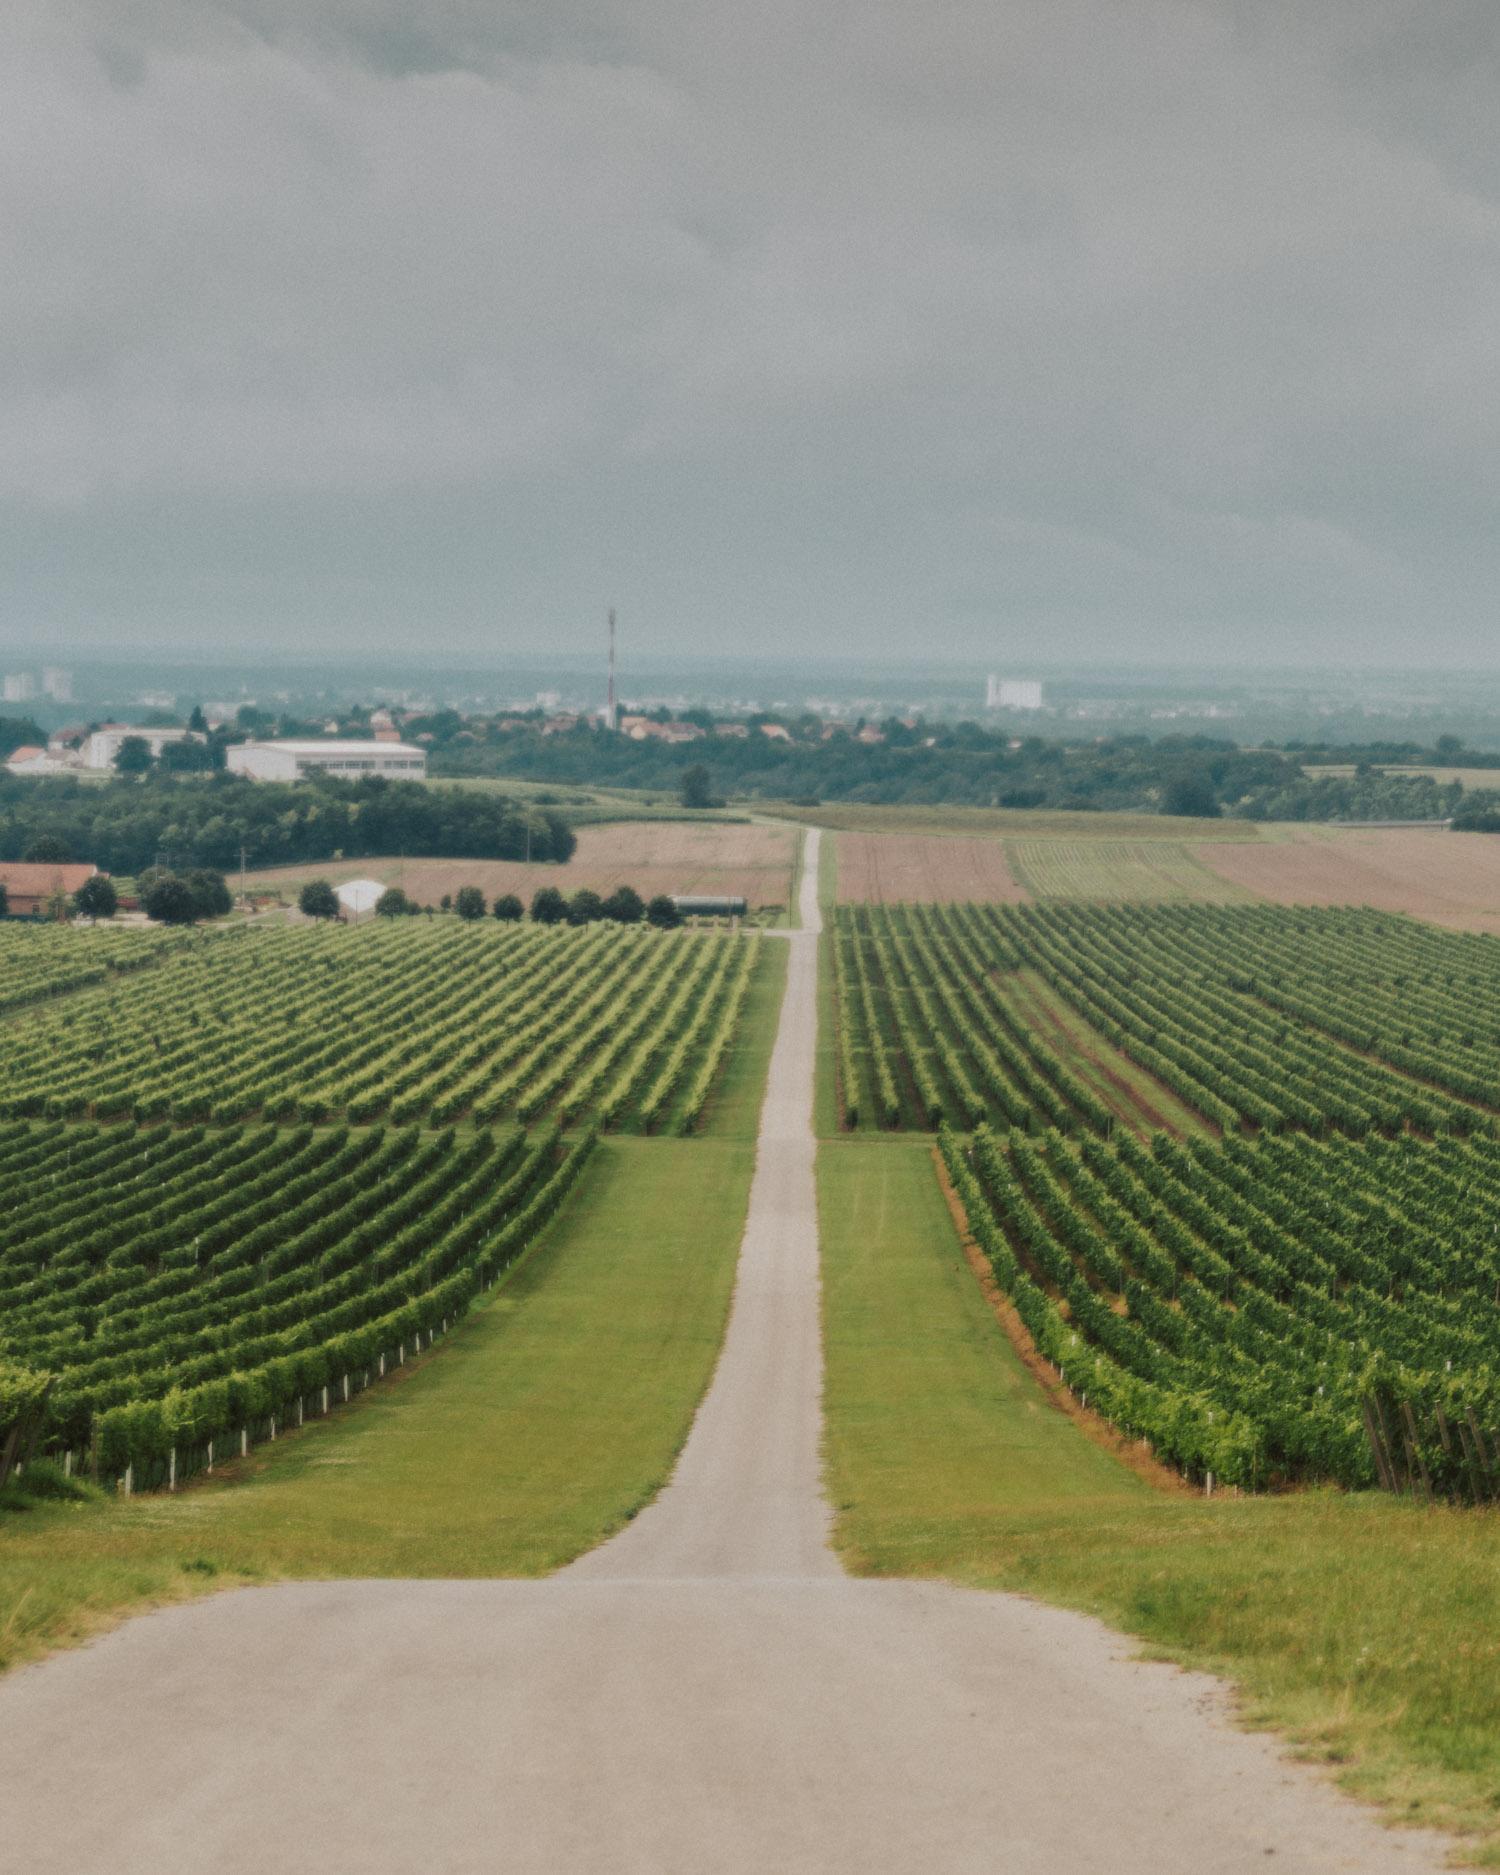 Vineyards in Slavonia